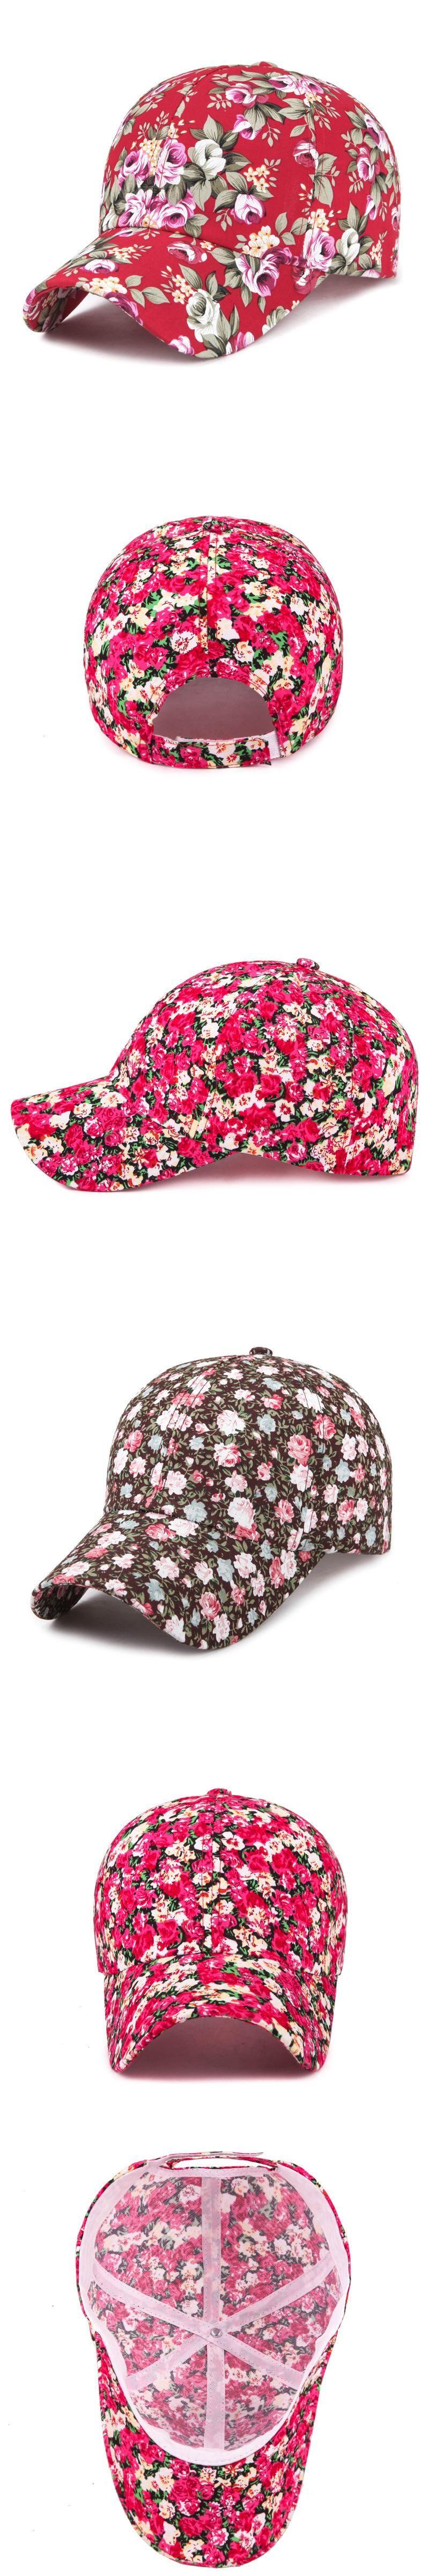 4897378ea3d63 2017 Samll Floral Baseball Cap For Women Summer Beach Fashion Flower Sun hat  Breathe Freely Mesh